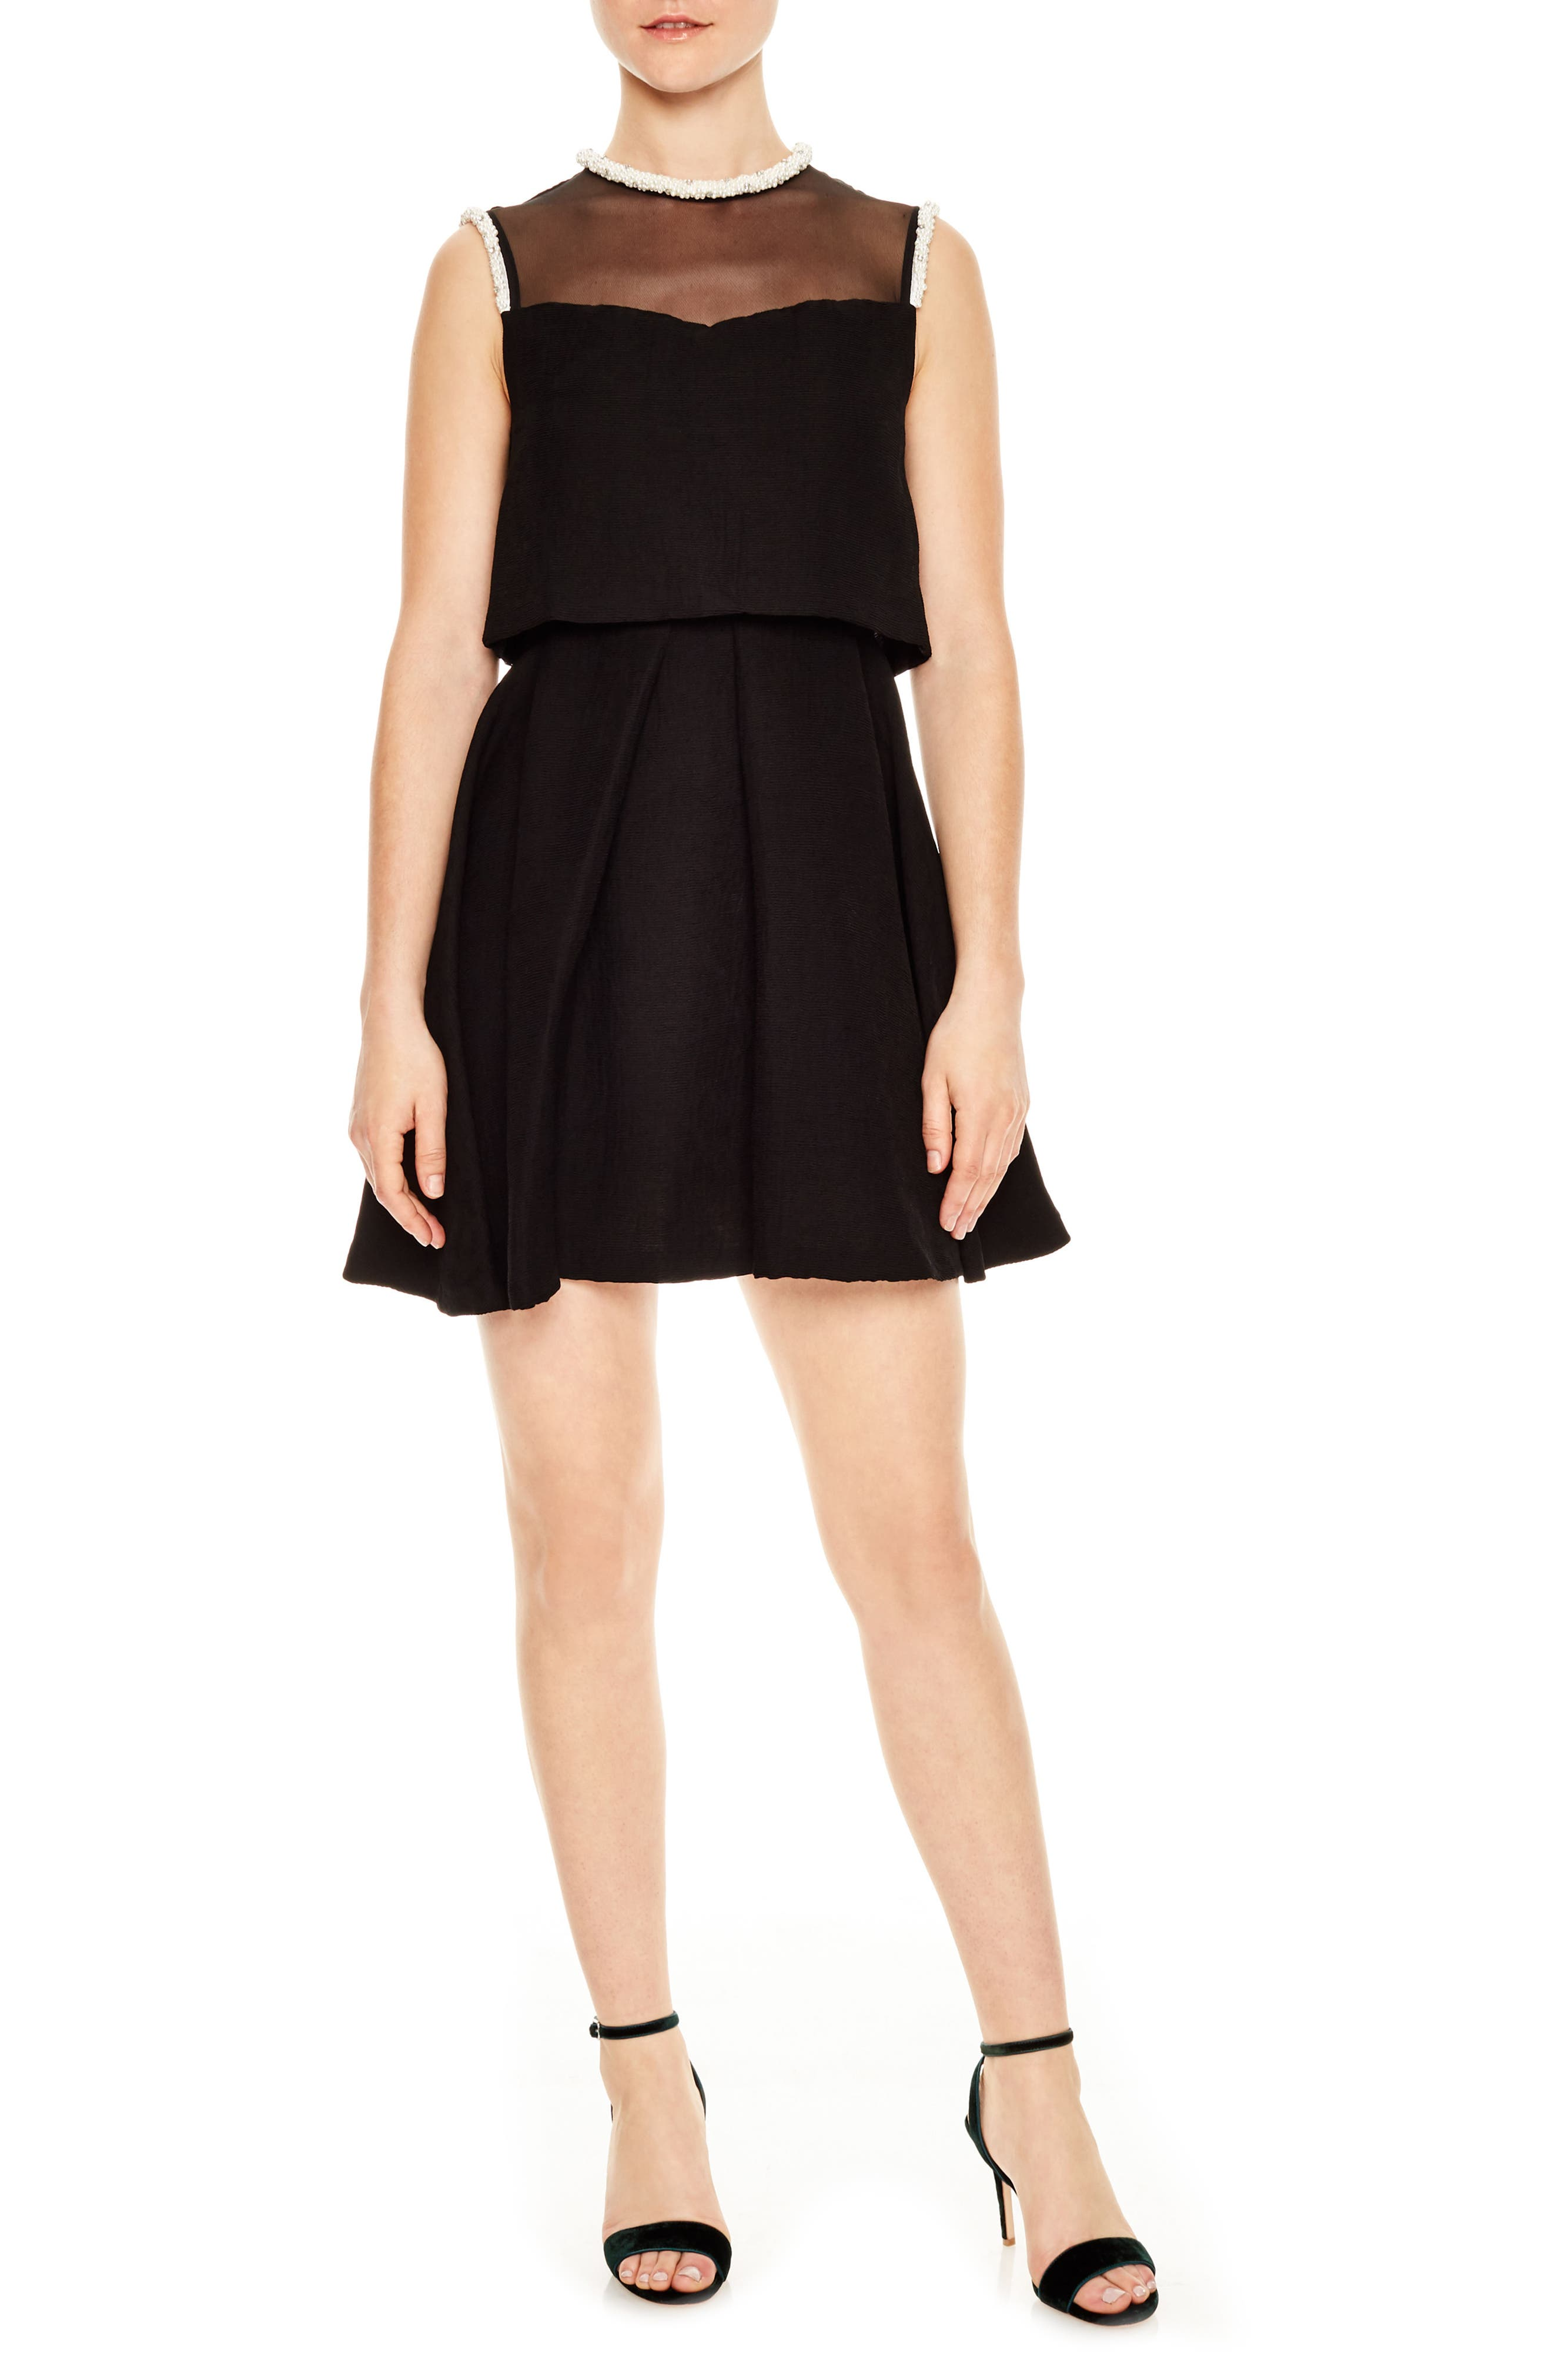 Ouma Jewel Neck Flare Dress,                             Main thumbnail 1, color,